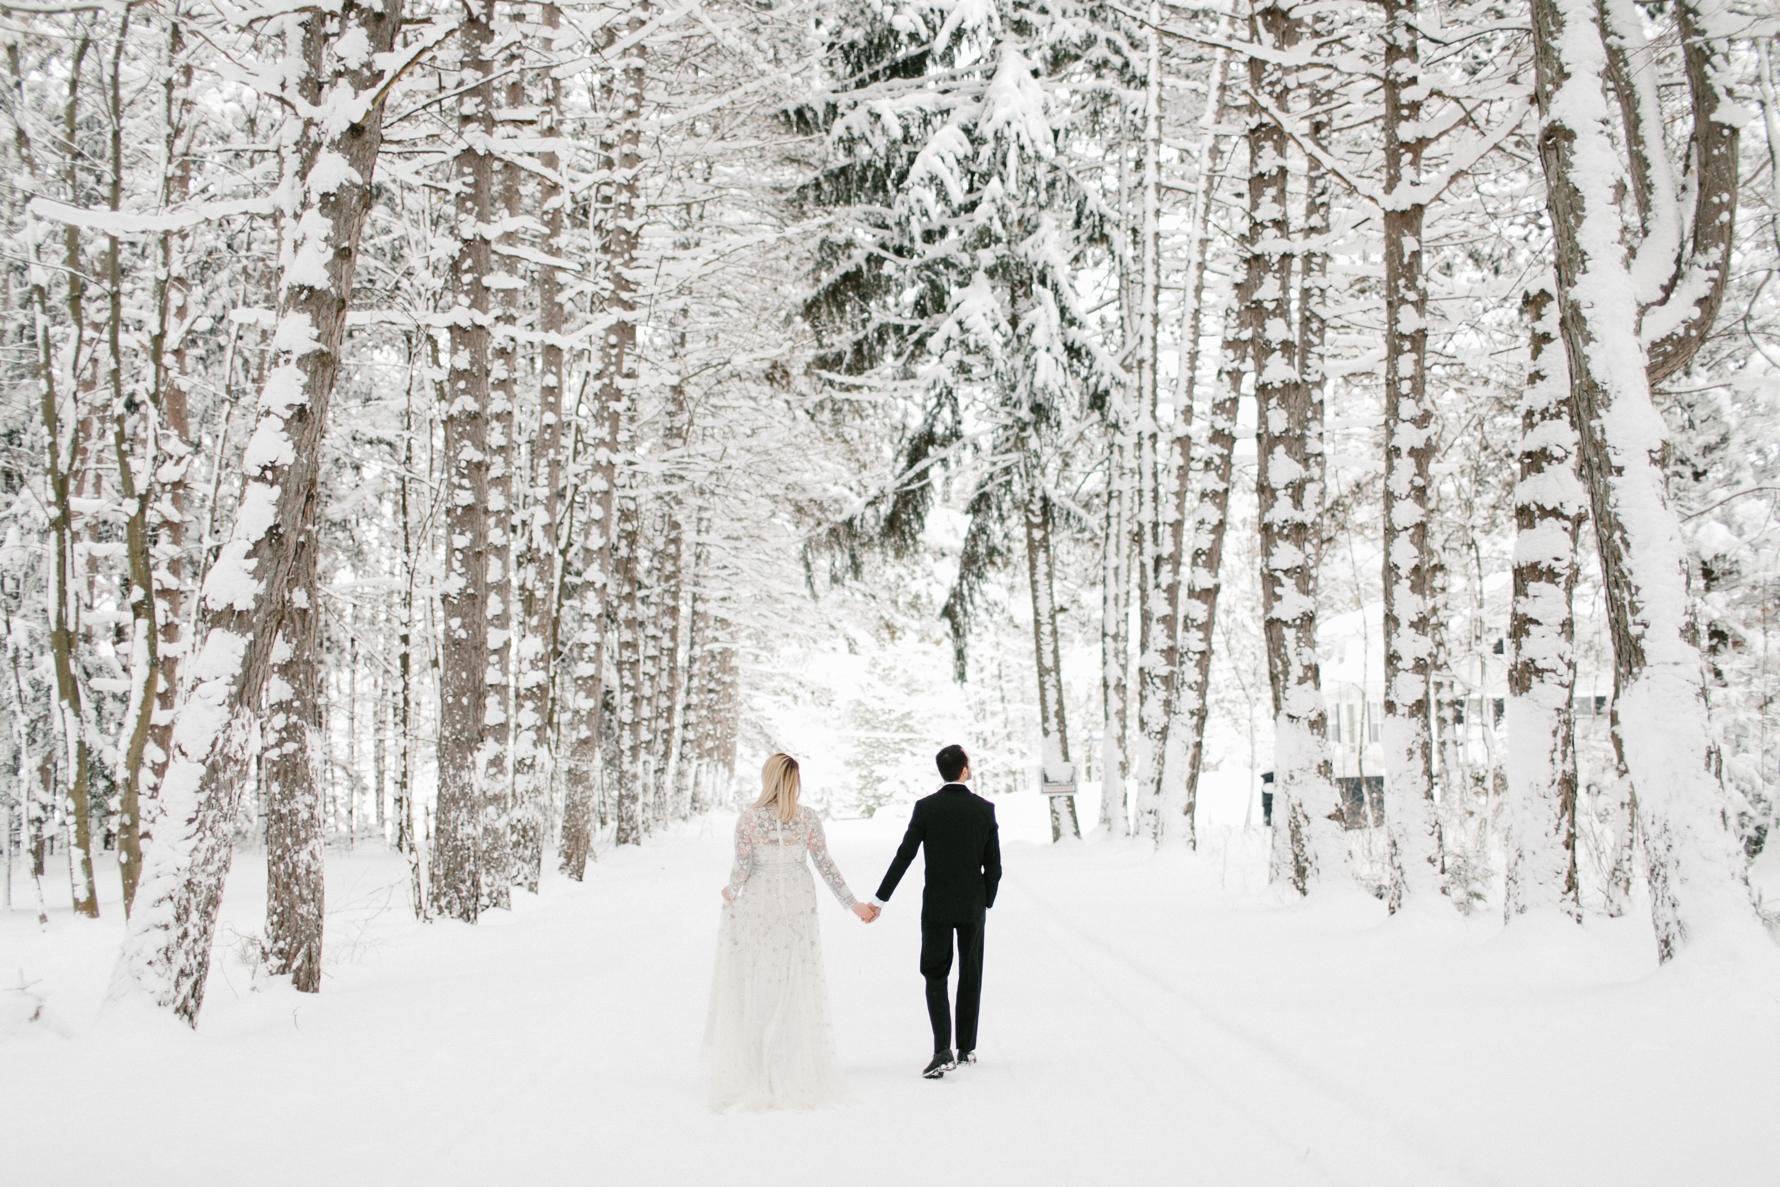 P + D's Winter Wedding at Castle Farms